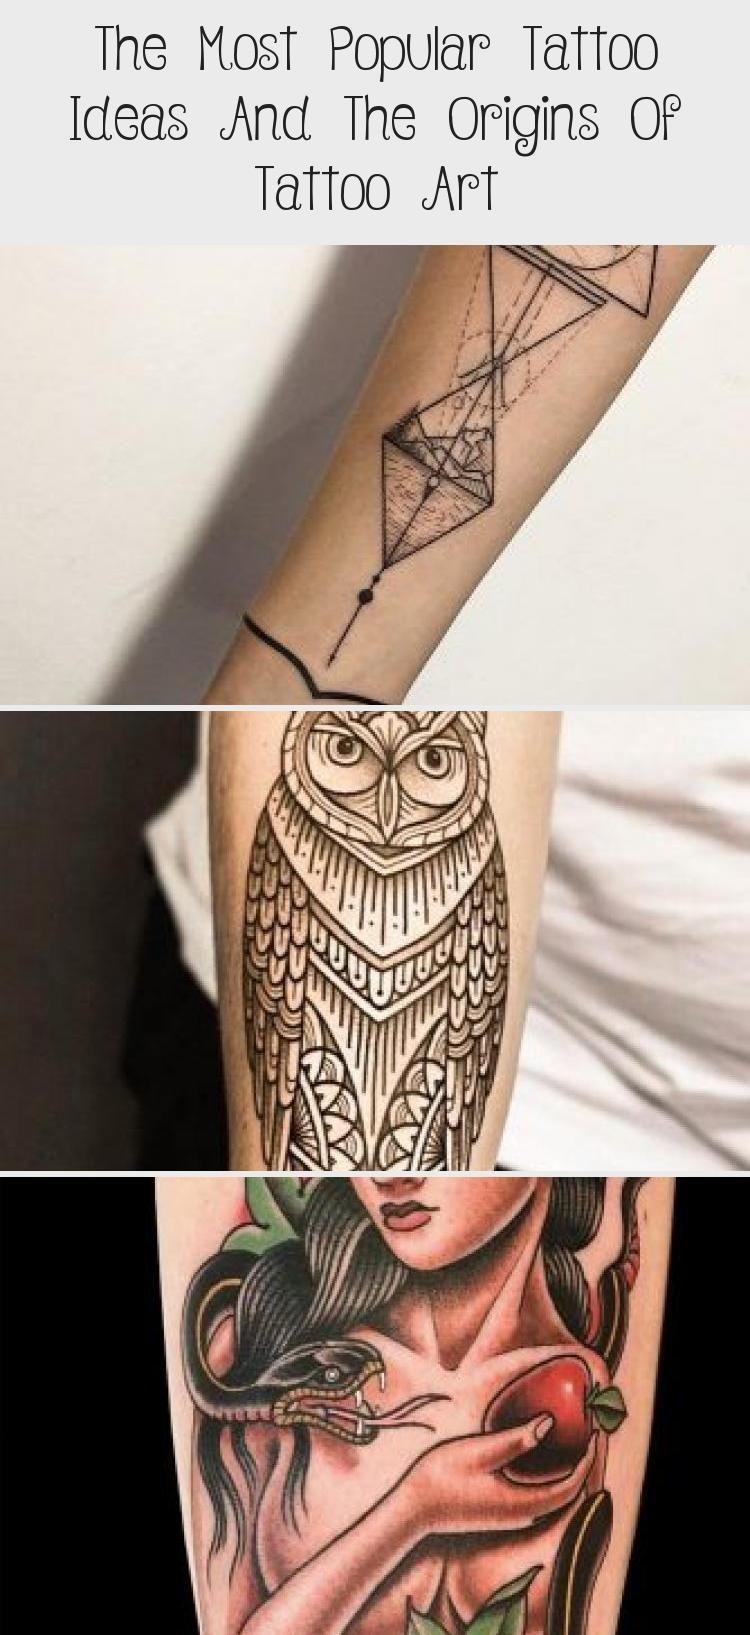 Minimalist Lotus Flower Design #minimalisttattoo #lotusflowertattoo ★ Explore unique and meaningful tattoo ideas. Whether you want a cute minimalist or a bigger tattoo, check out female tattoo art here. ★  #tattooideas #tattoodesigns #tattooforwomen #womentattooideas #glaminati #lifestyle #TattoosandBodyArtGeometricShapes #TattoosandBodyArtScripts #TattoosandBodyArtBeautyPhotos #TattoosandBodyArtWatercolors #TattoosandBodyArtGirls